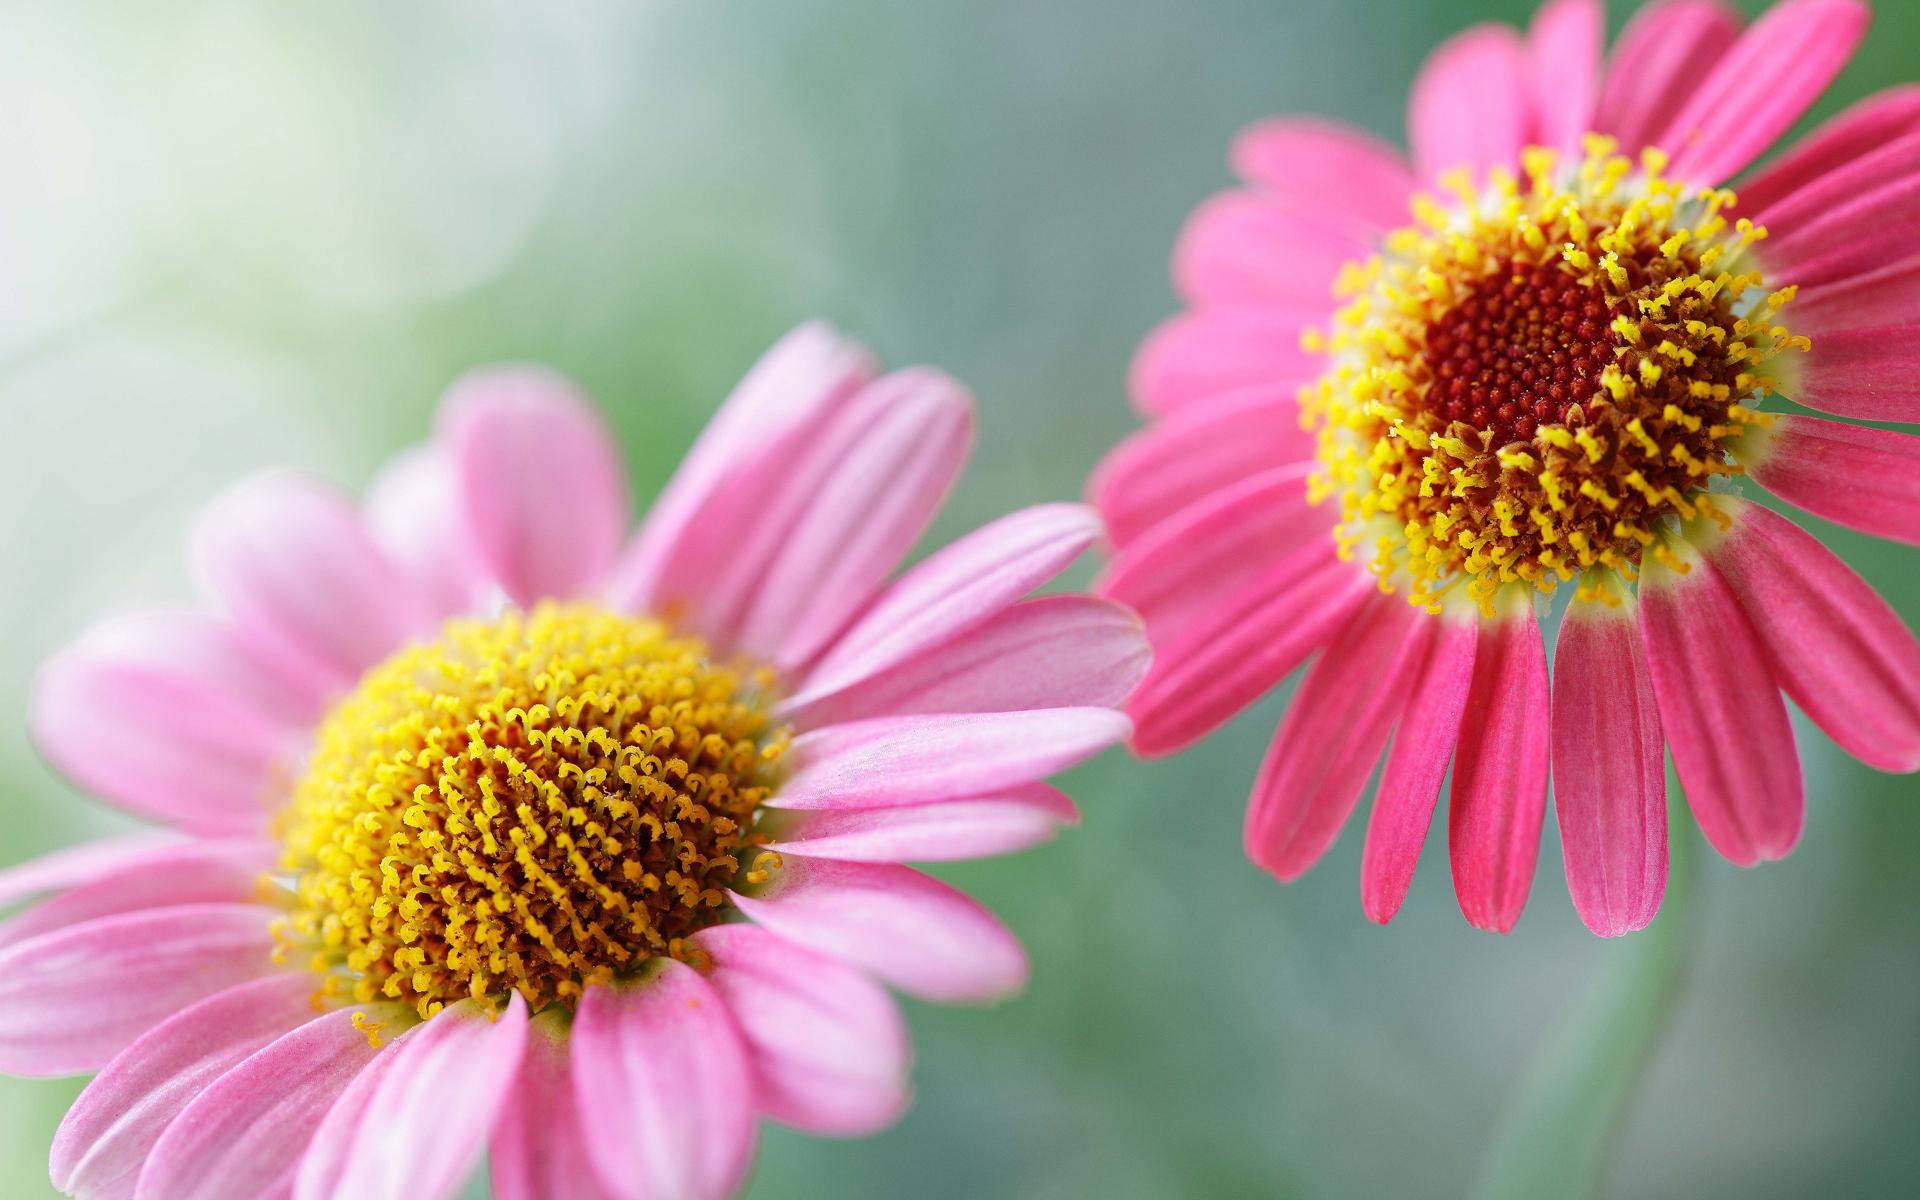 pink flowers wallpaper hd 44651